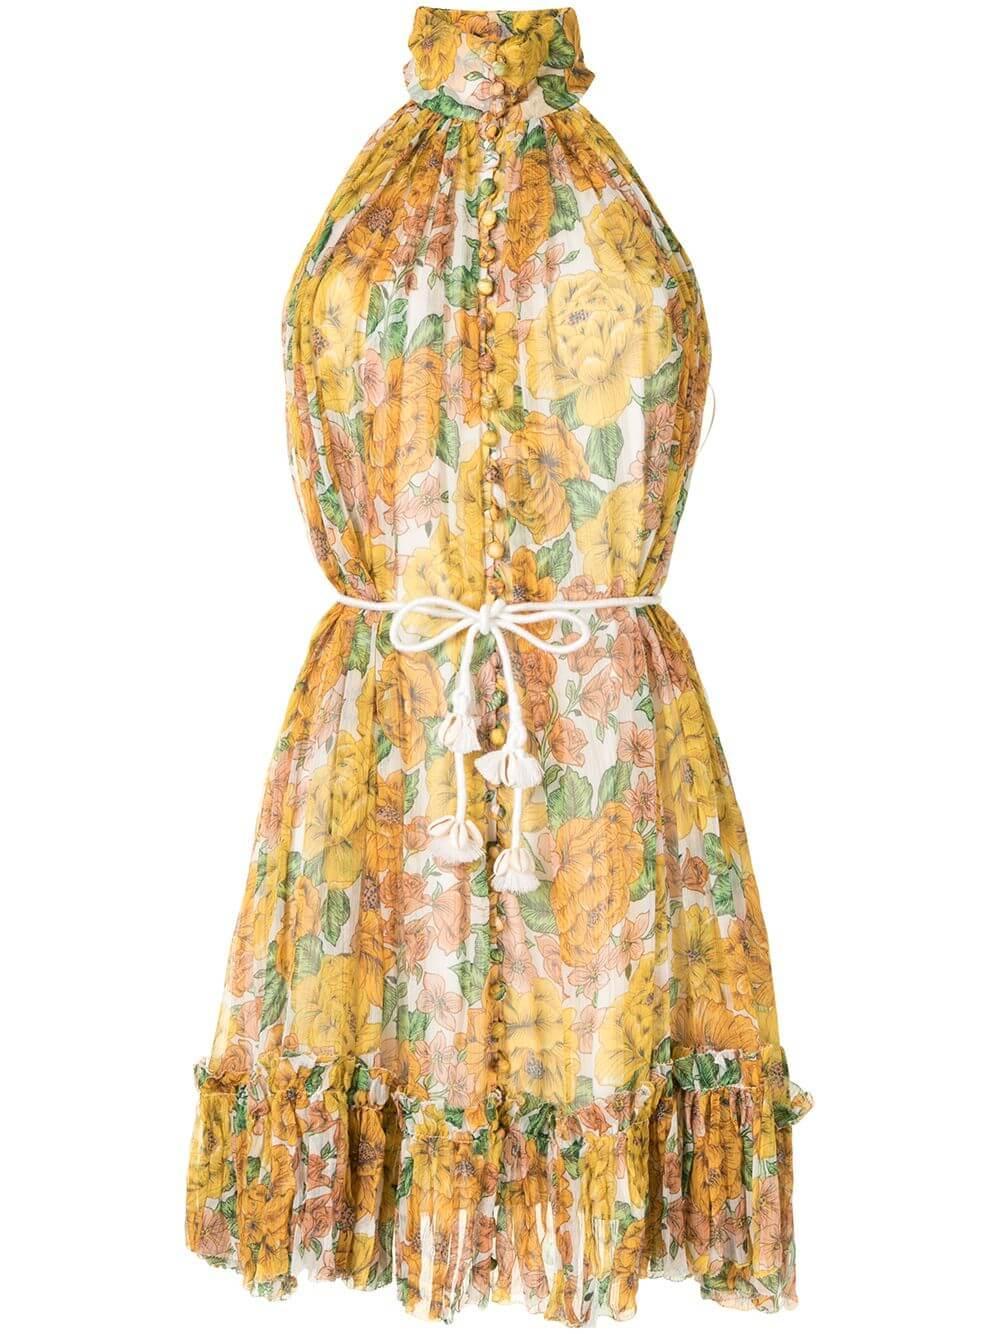 Poppy Halter Dress Item # 5769DPOP